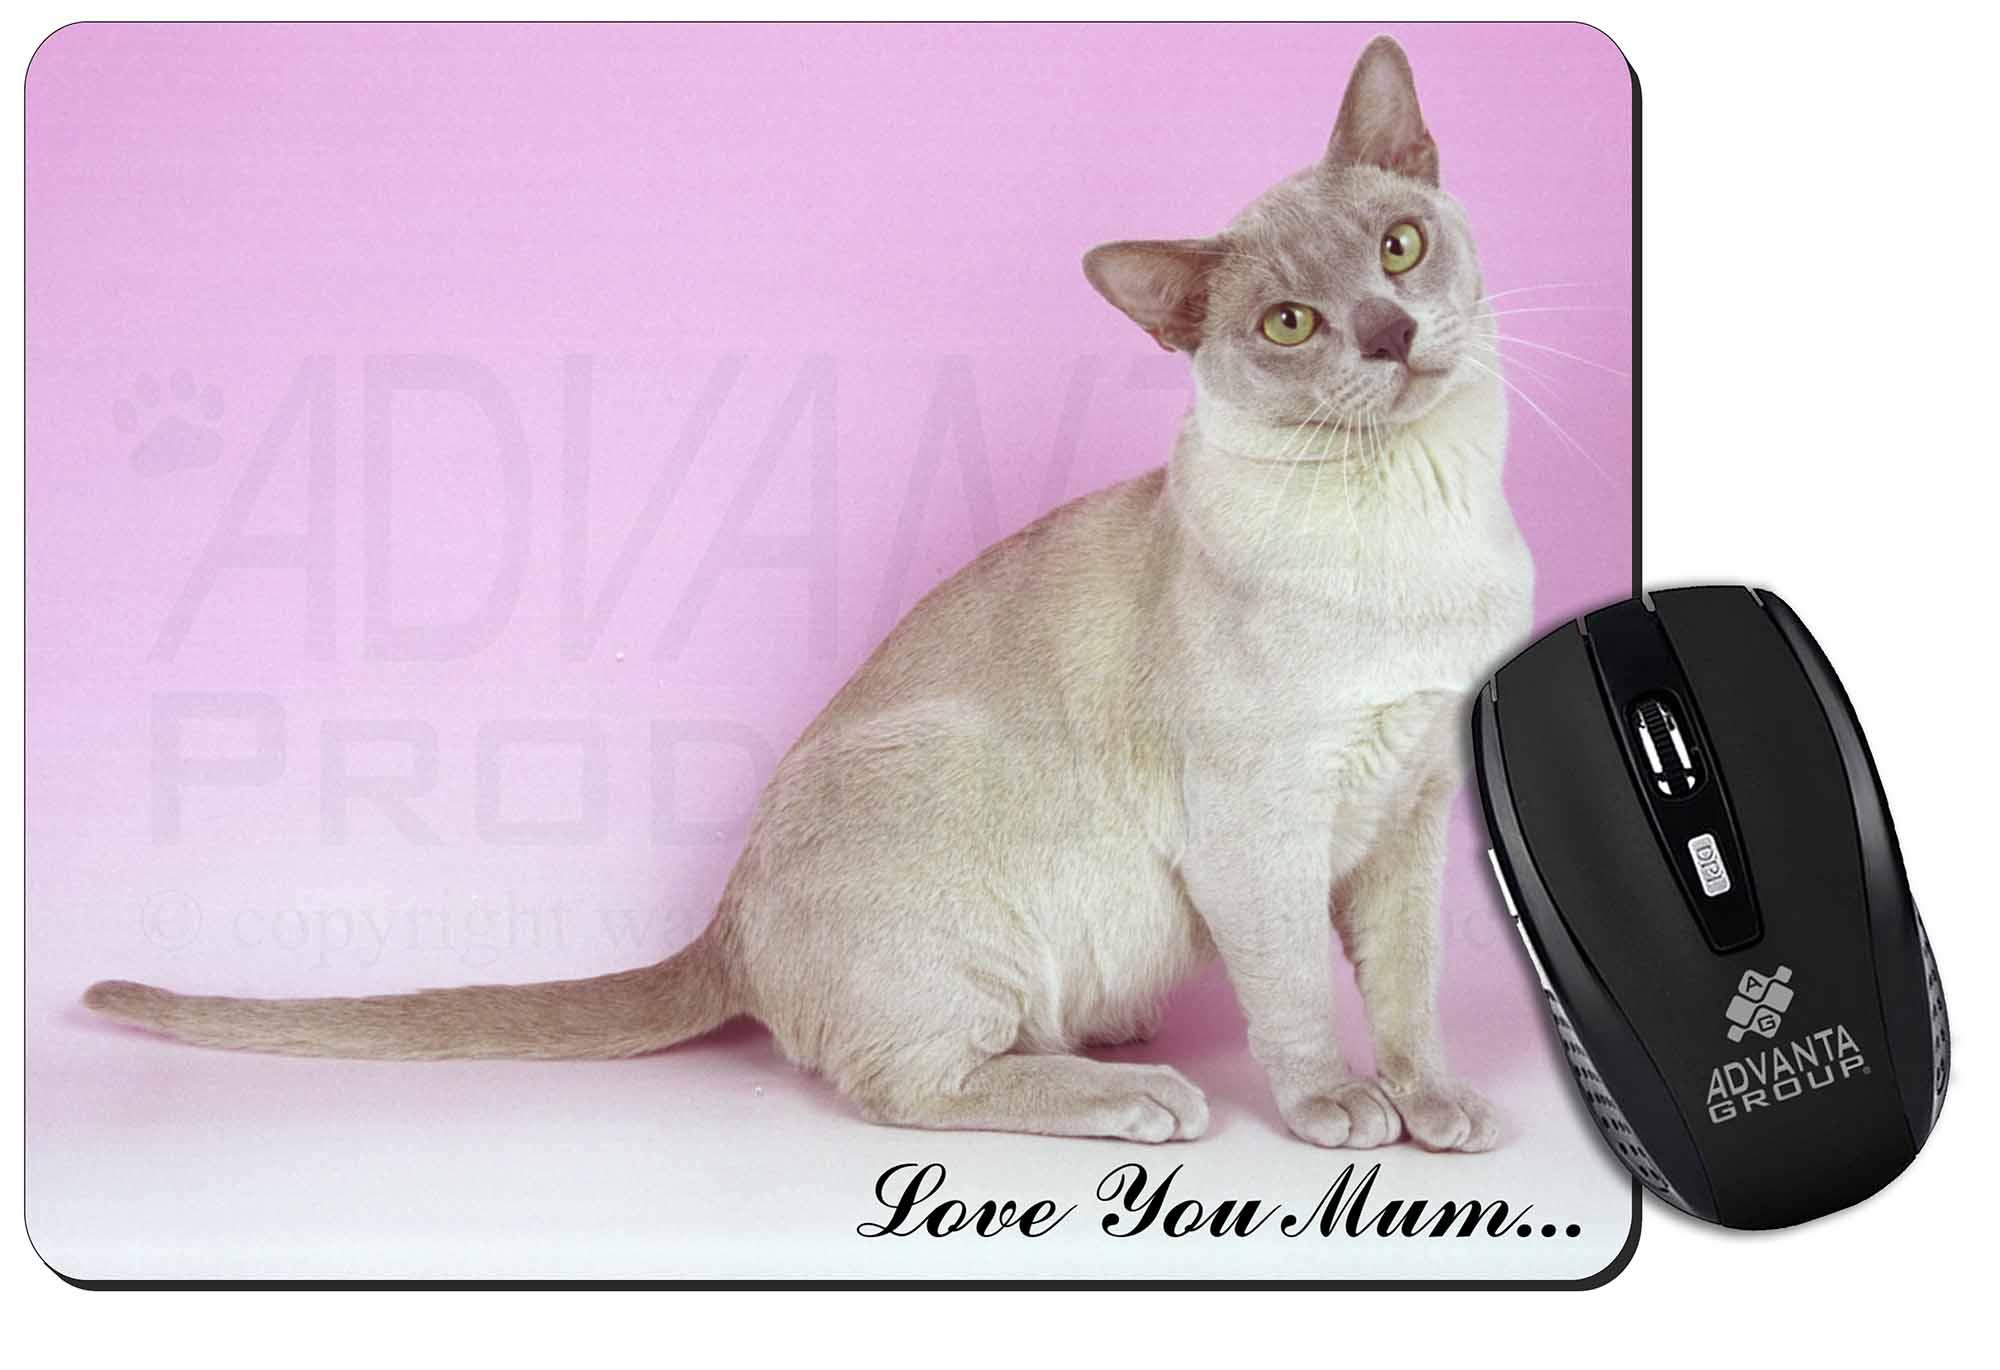 Sticker 102-Panini-webstars 2017-Mert matan